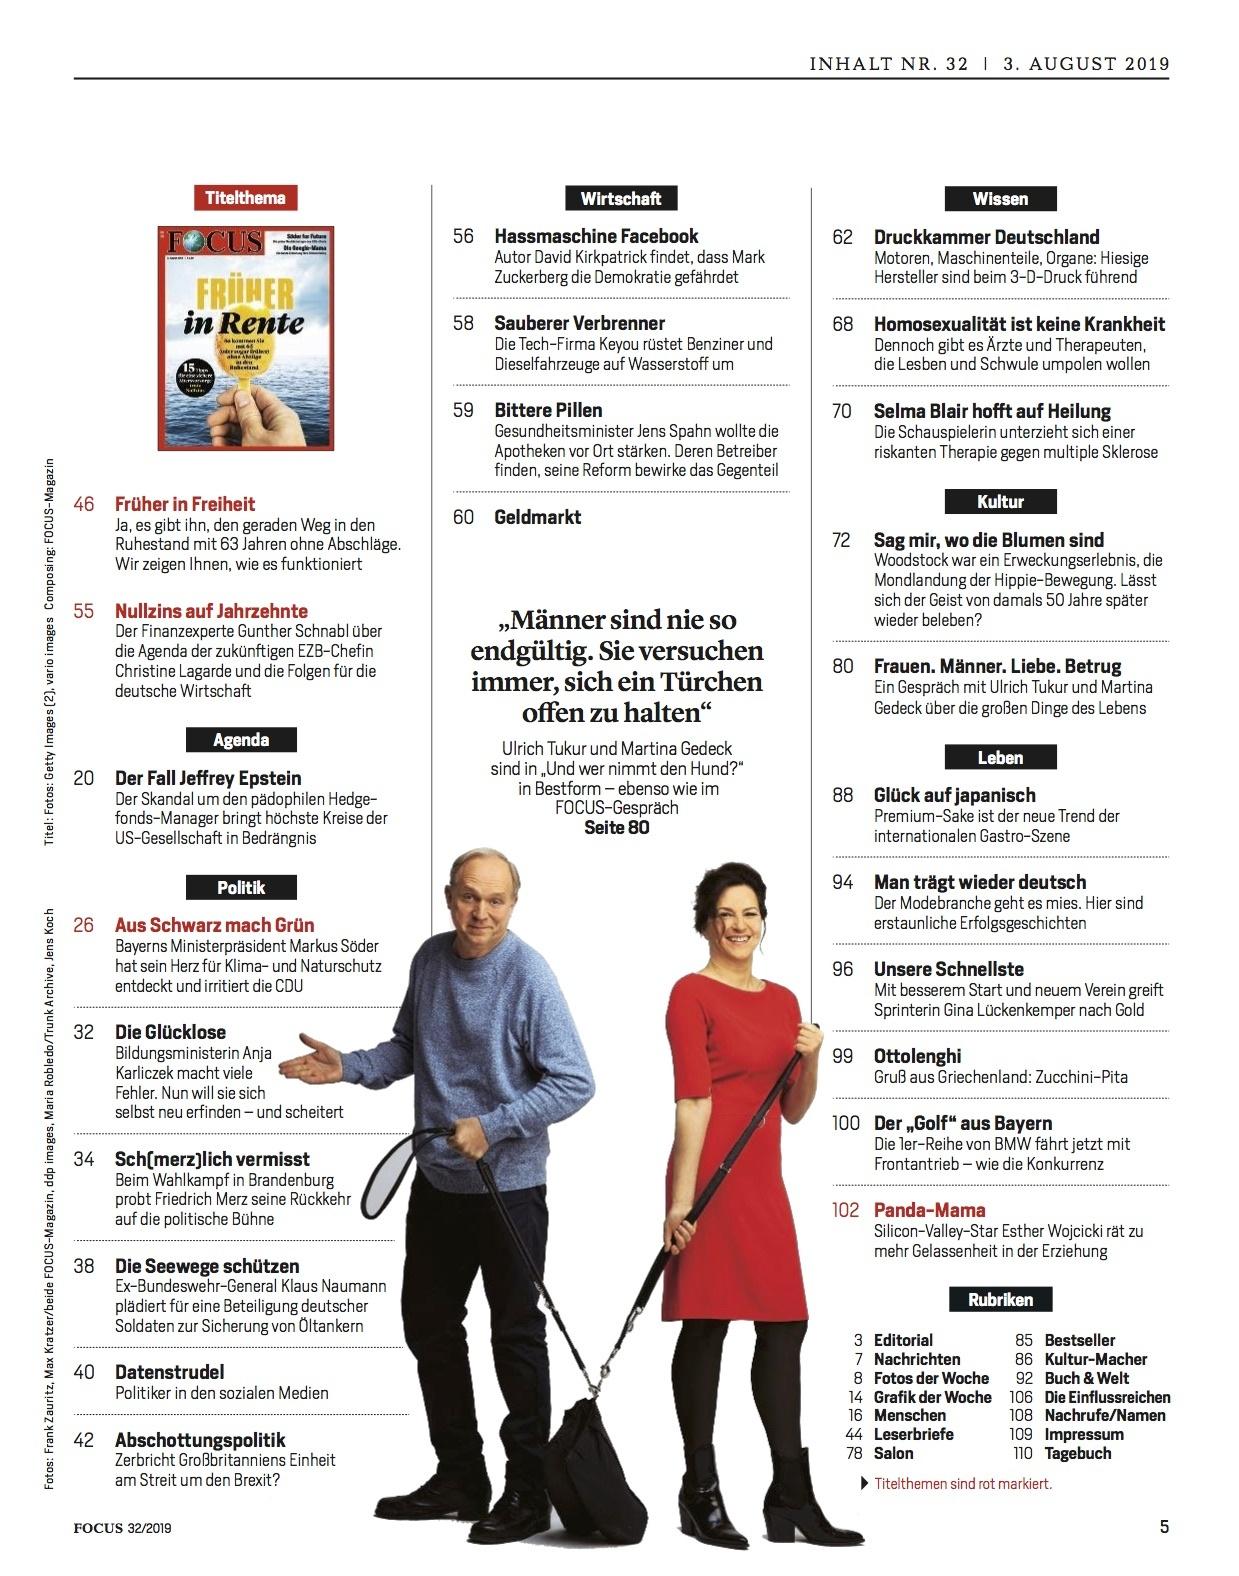 FOCUS Magazin FOCUS Magazin - Früher in Rente